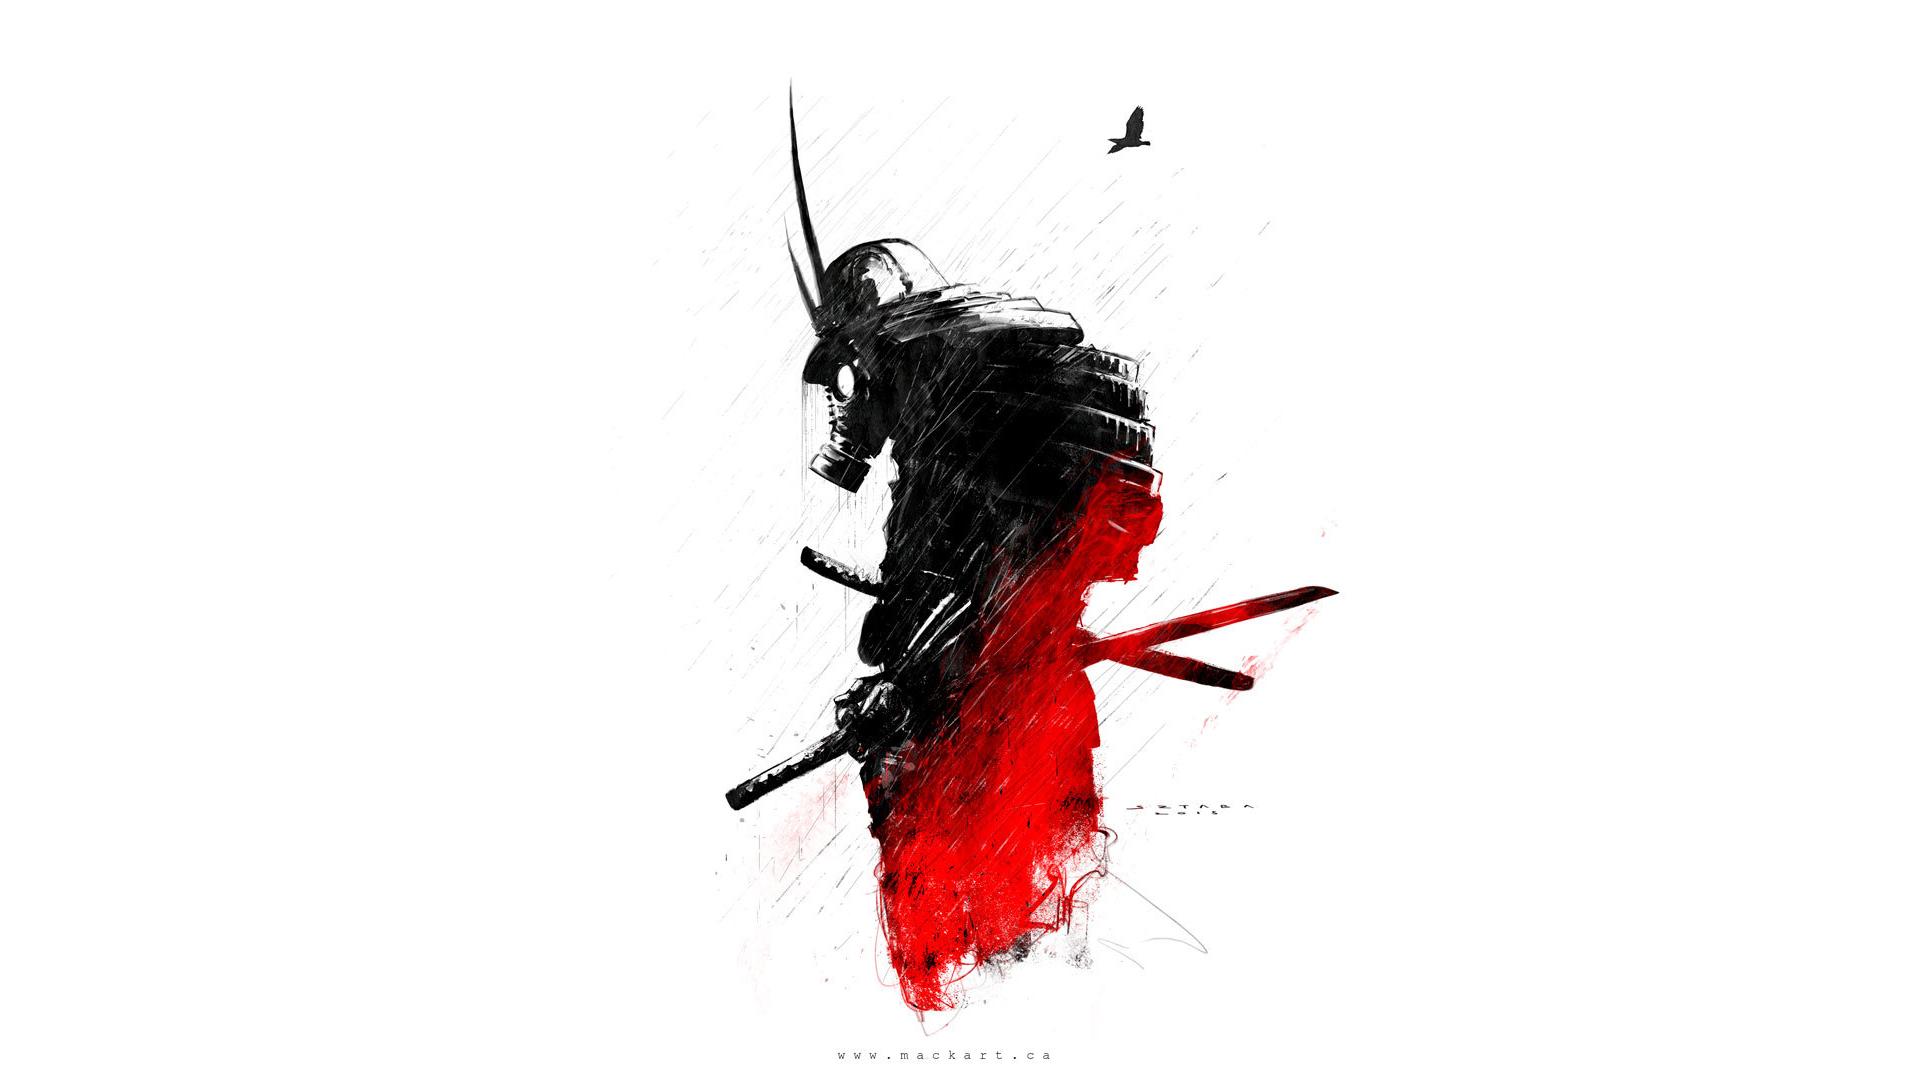 Fond D Ecran Samourai Dessin Masques A Gaz 1920x1080 Vfgx 1291805 Fond D Ecran Wallhere